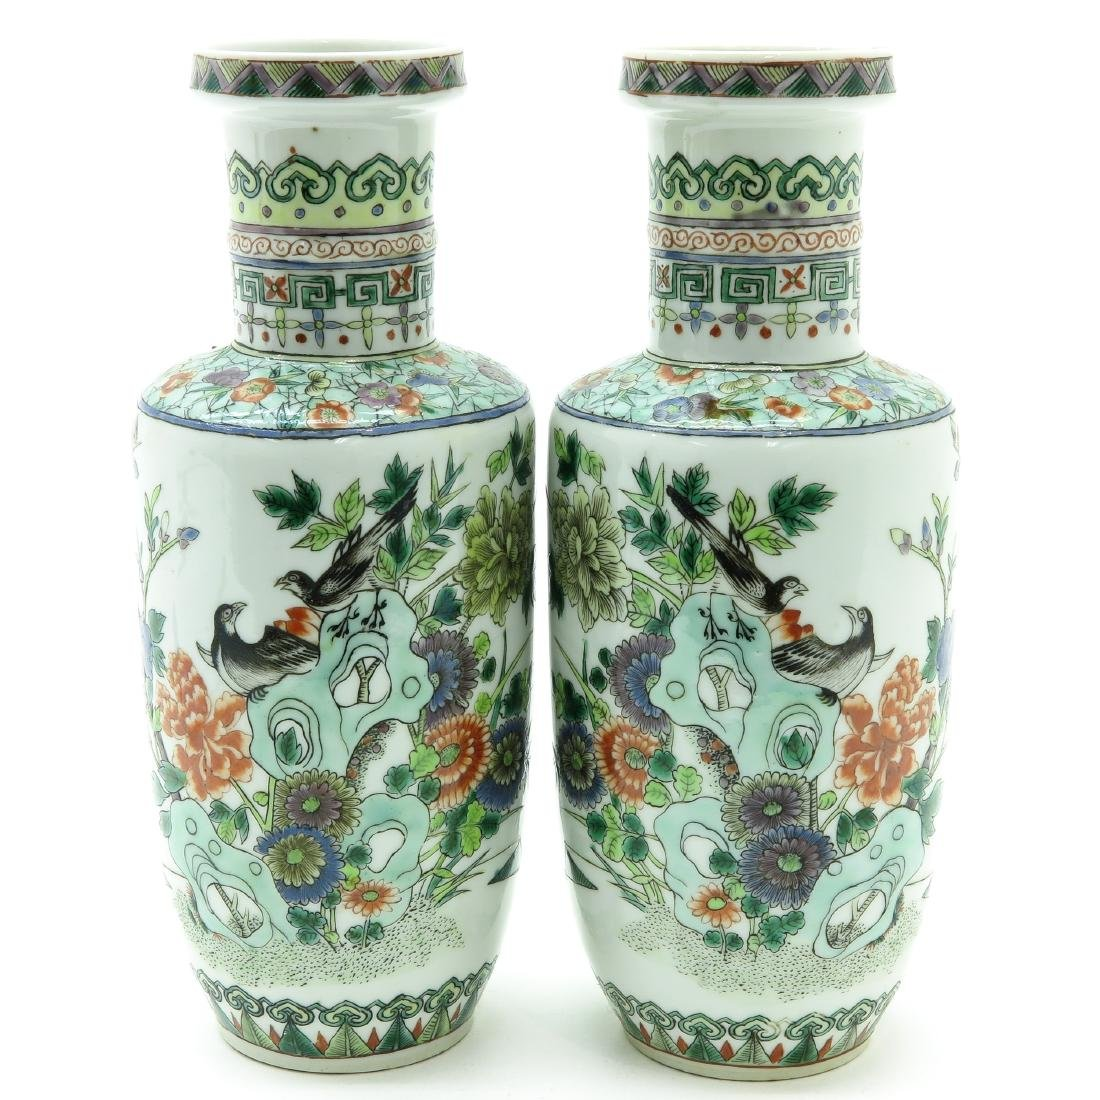 A Pair of Famille Verte Decor Rouleau Vases